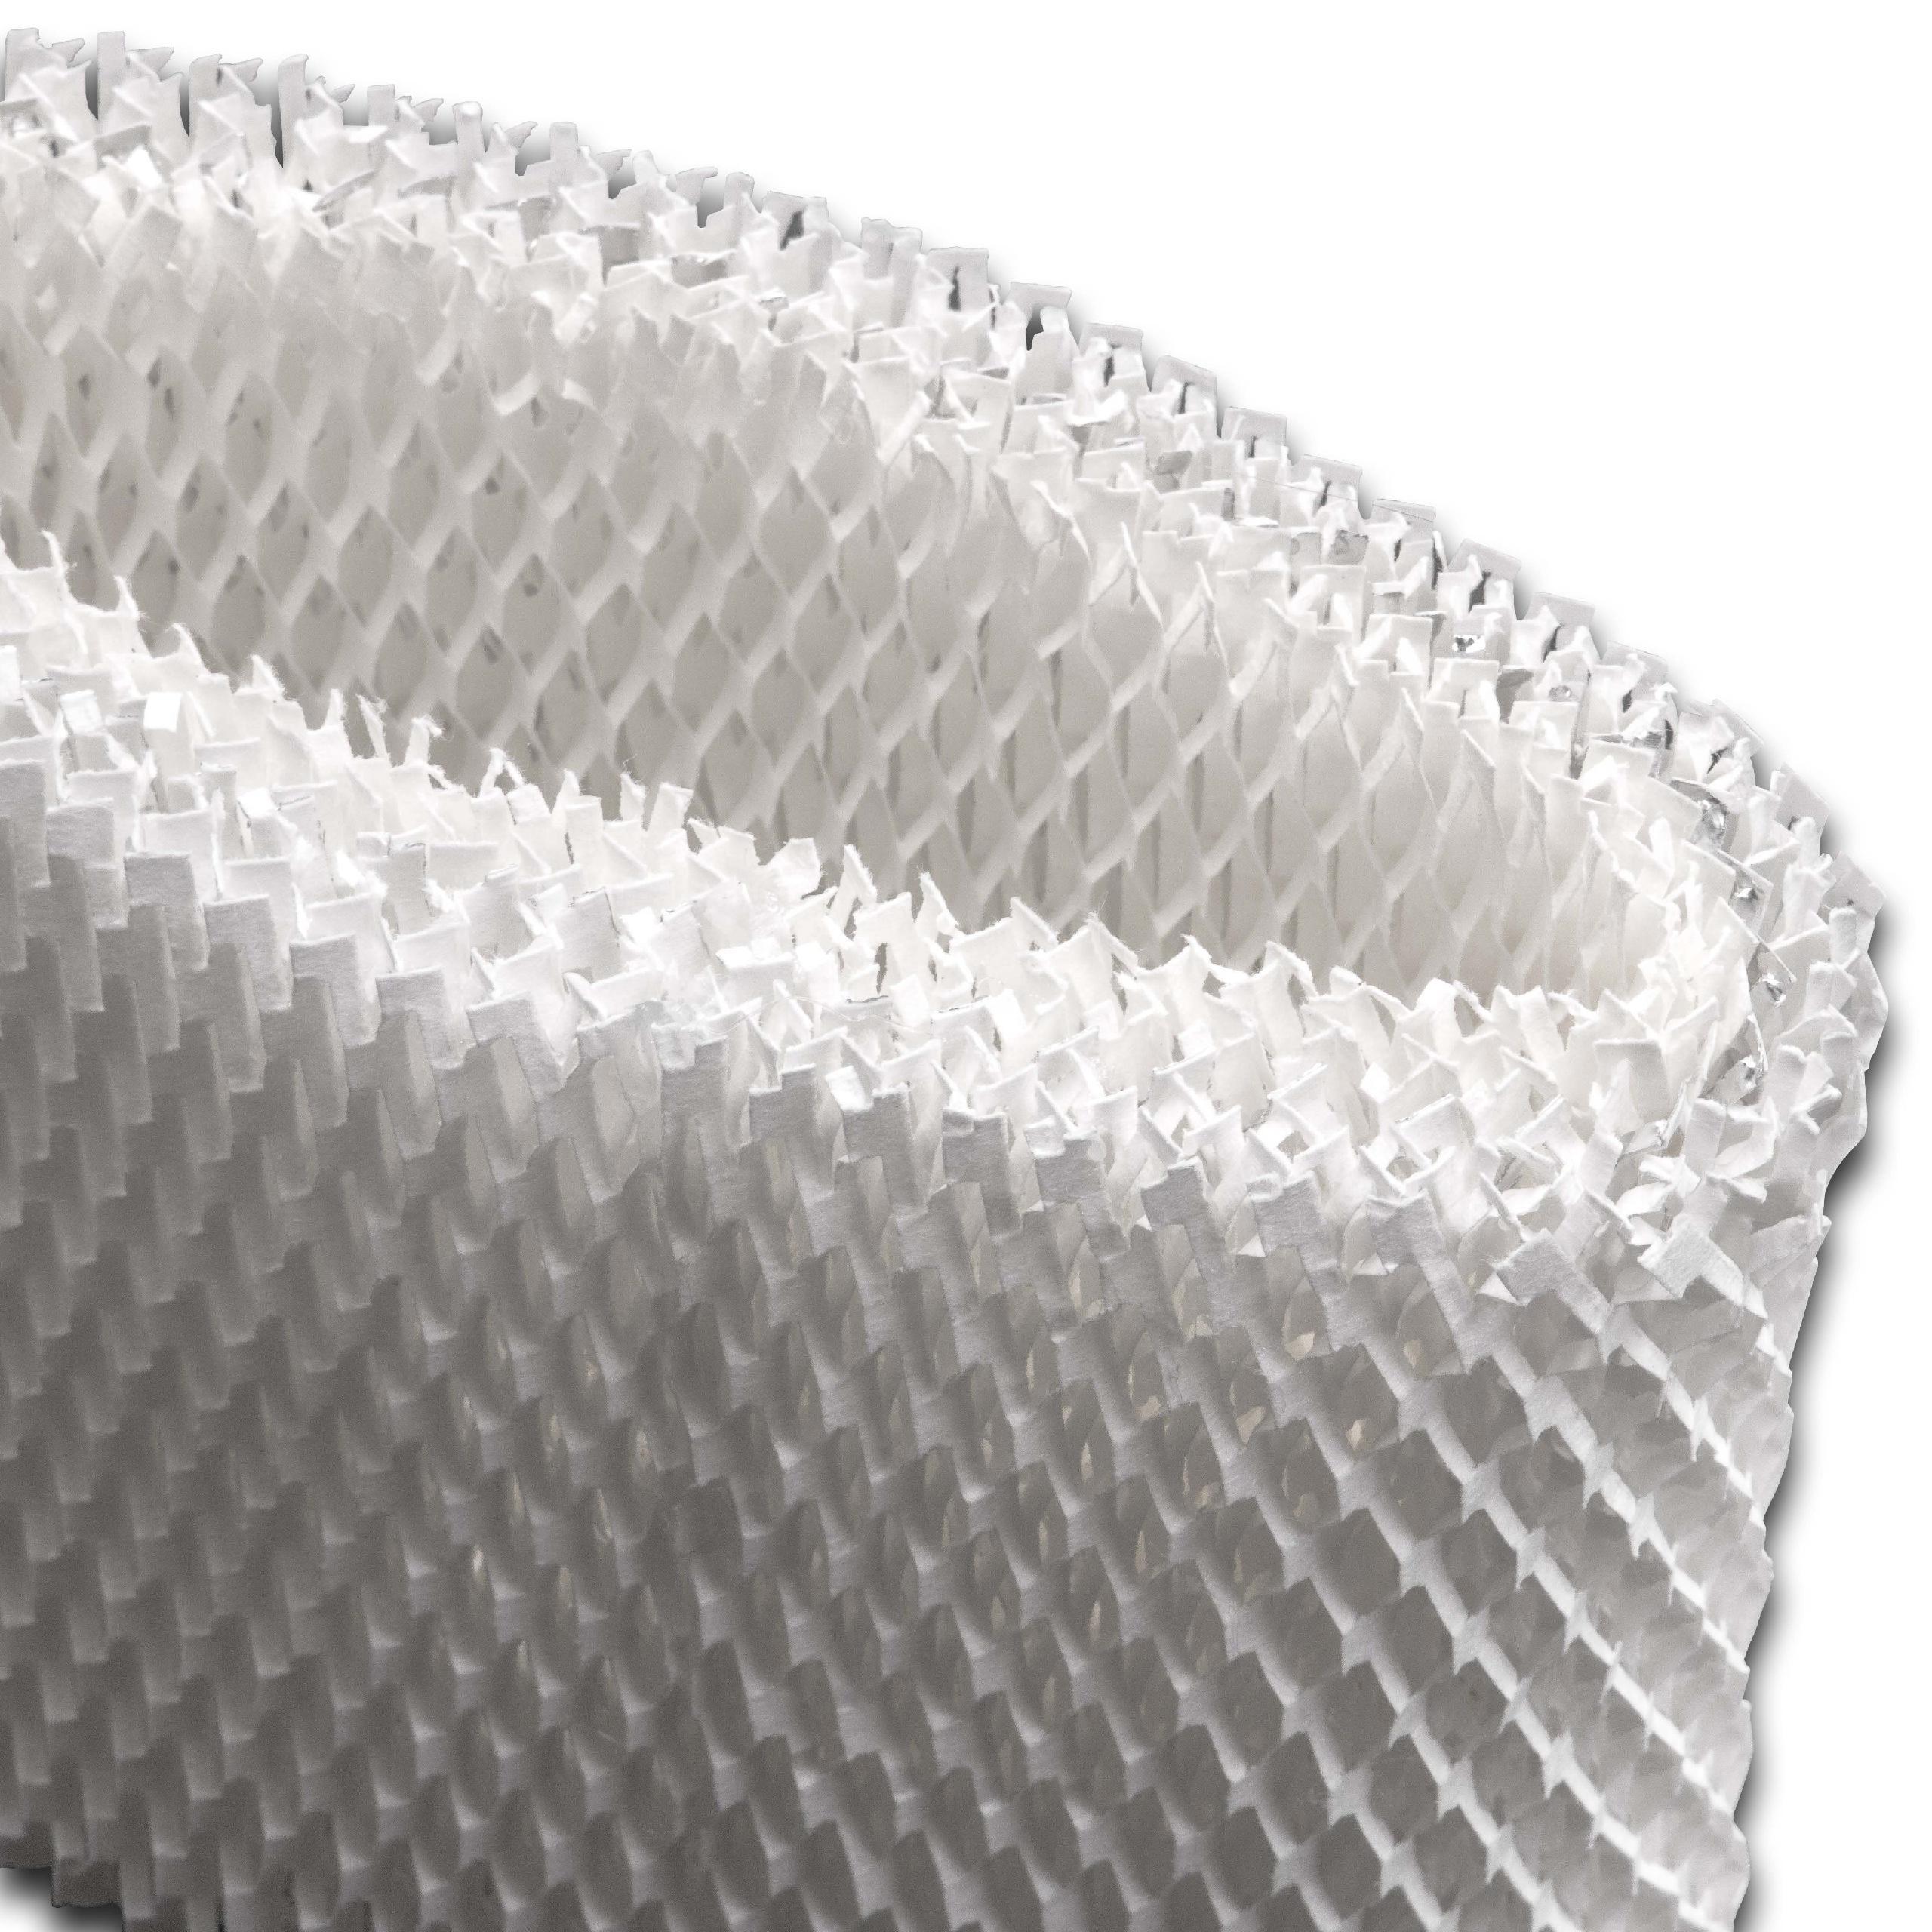 Luftbefeuchter Filter für Honeywell Protec Modell HH-350E hcm-631 hcm-630